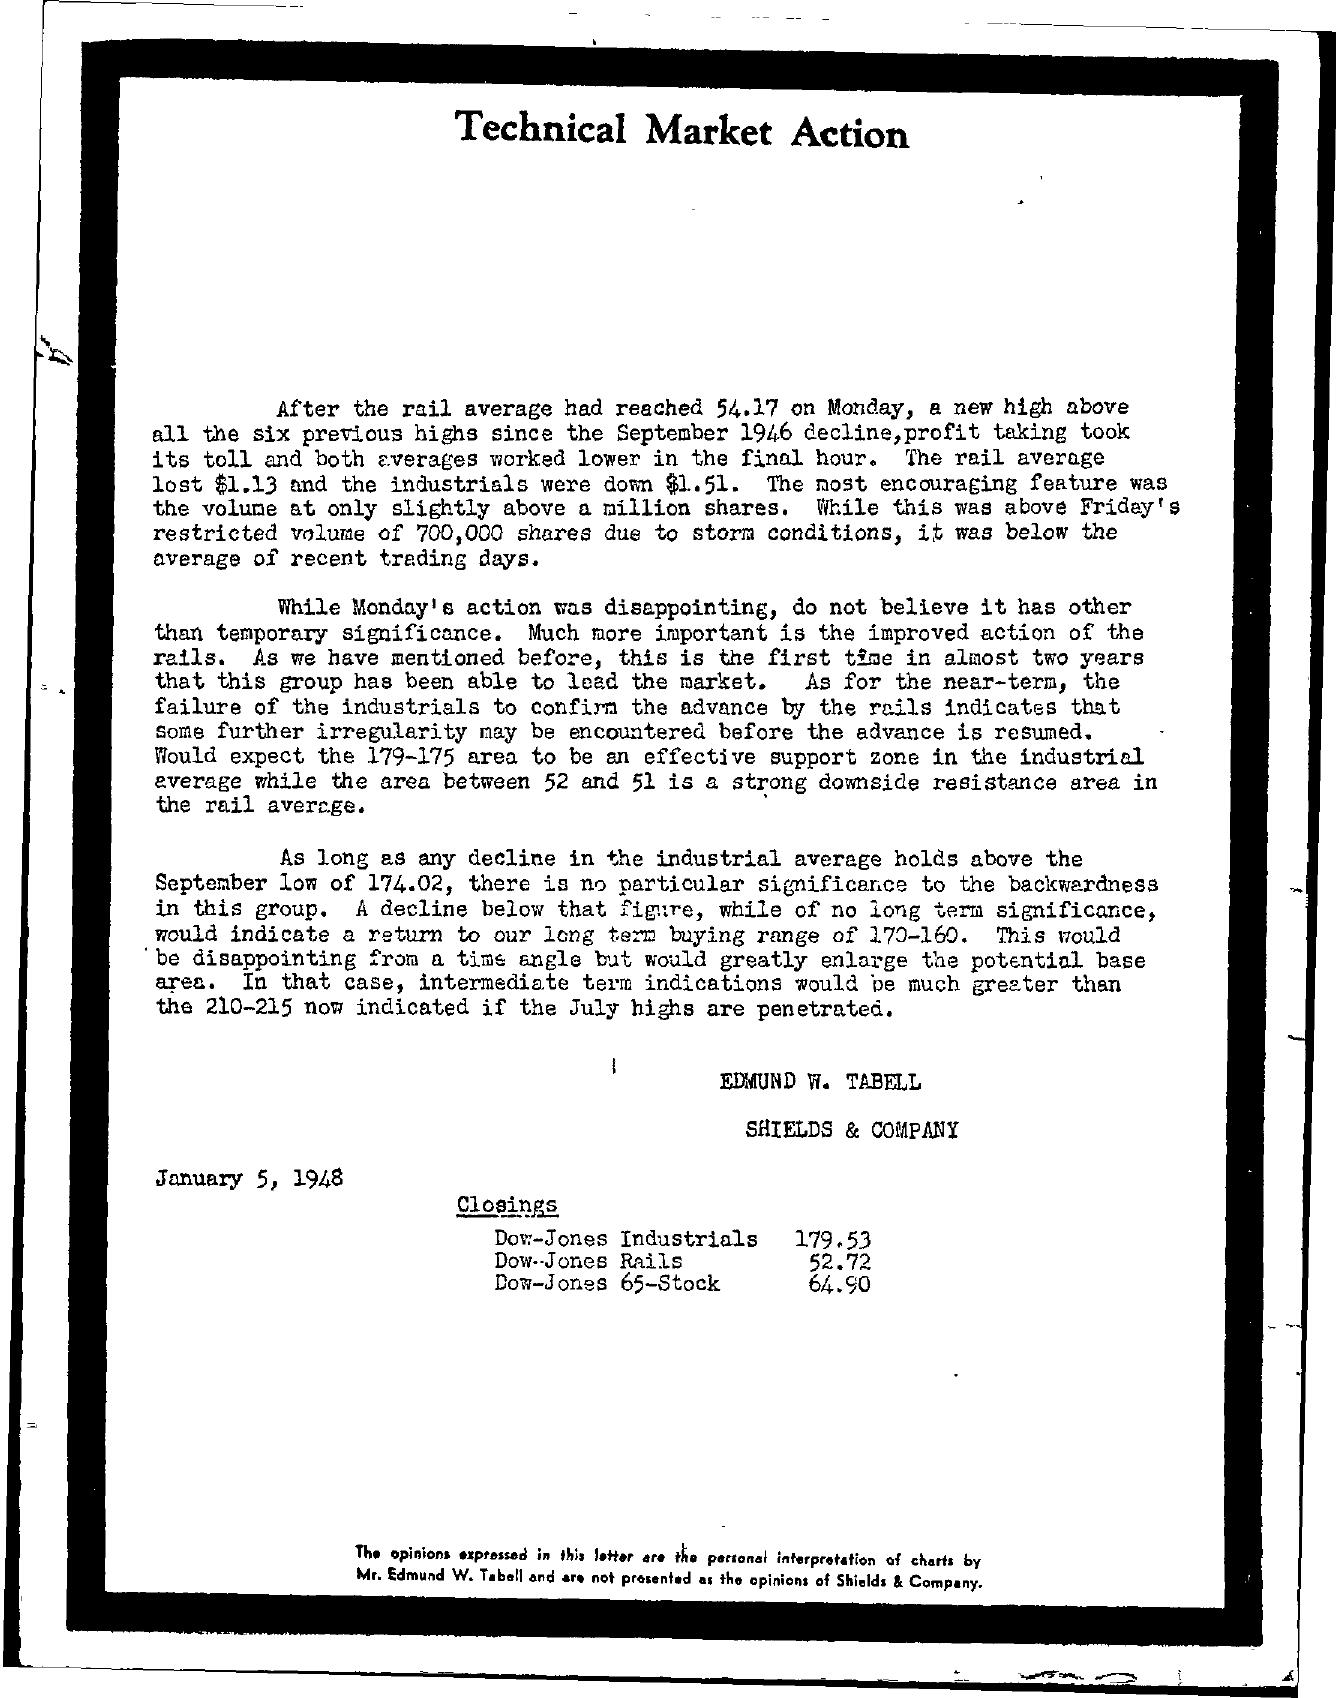 Tabell's Market Letter - January 05, 1948